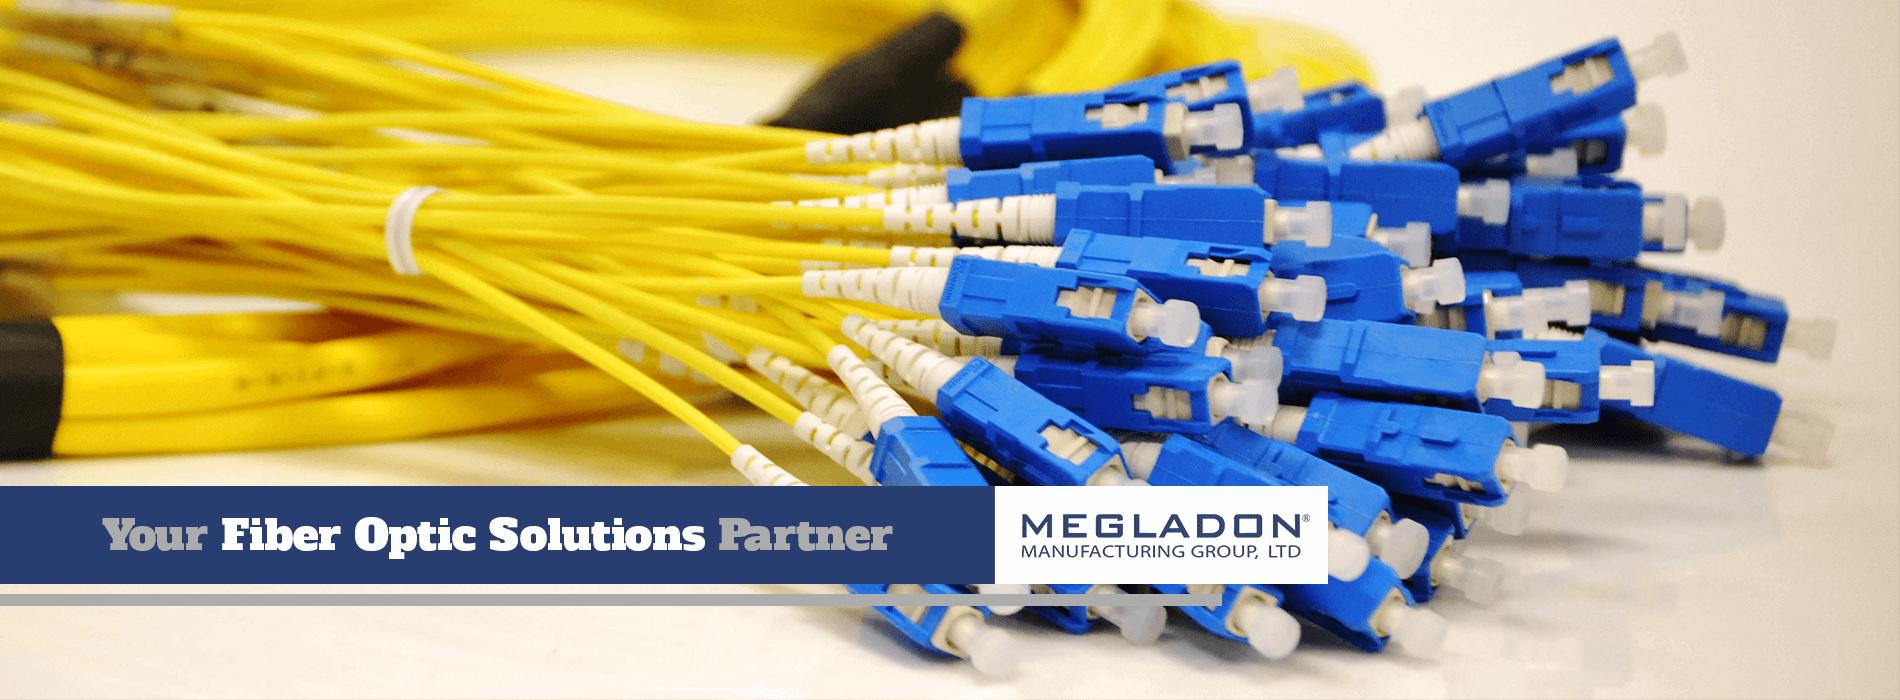 TyRex Photo: Megladon Manufacturing Group, Ltd.